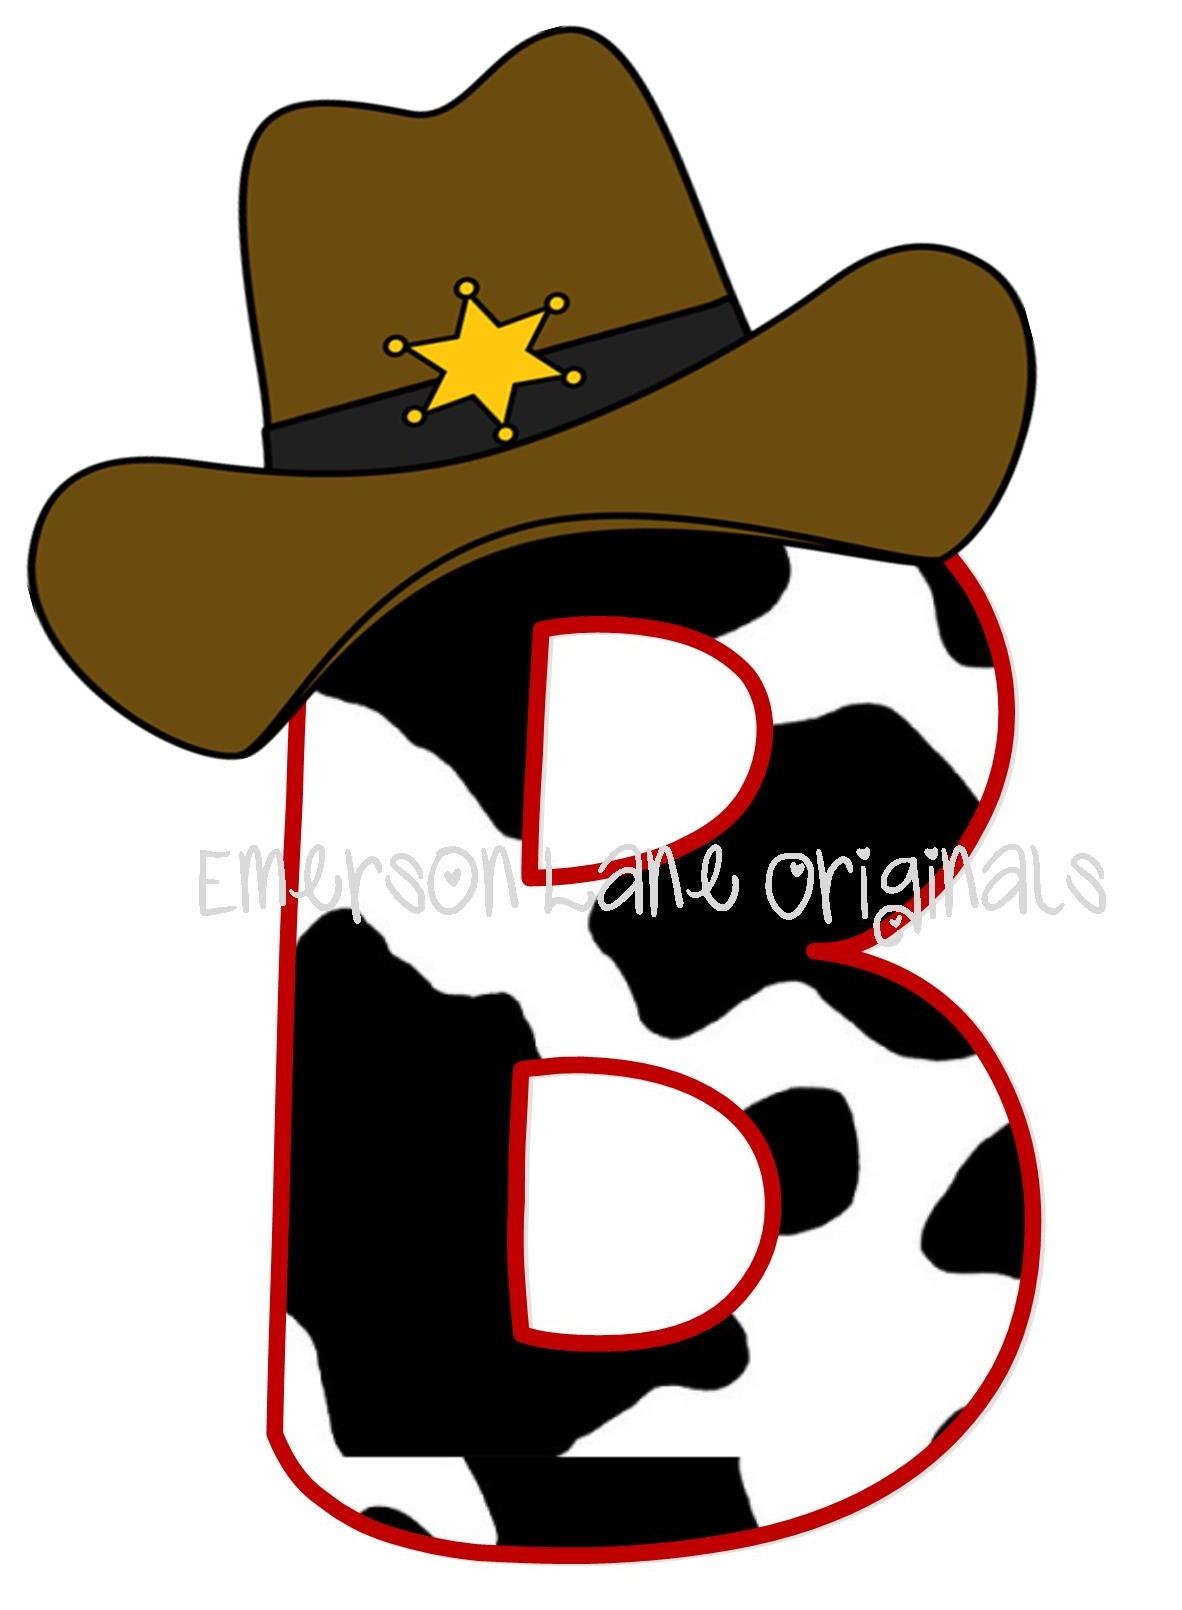 Cowboy Monogram In Cow Print T Shirt Emerson Lane Originals